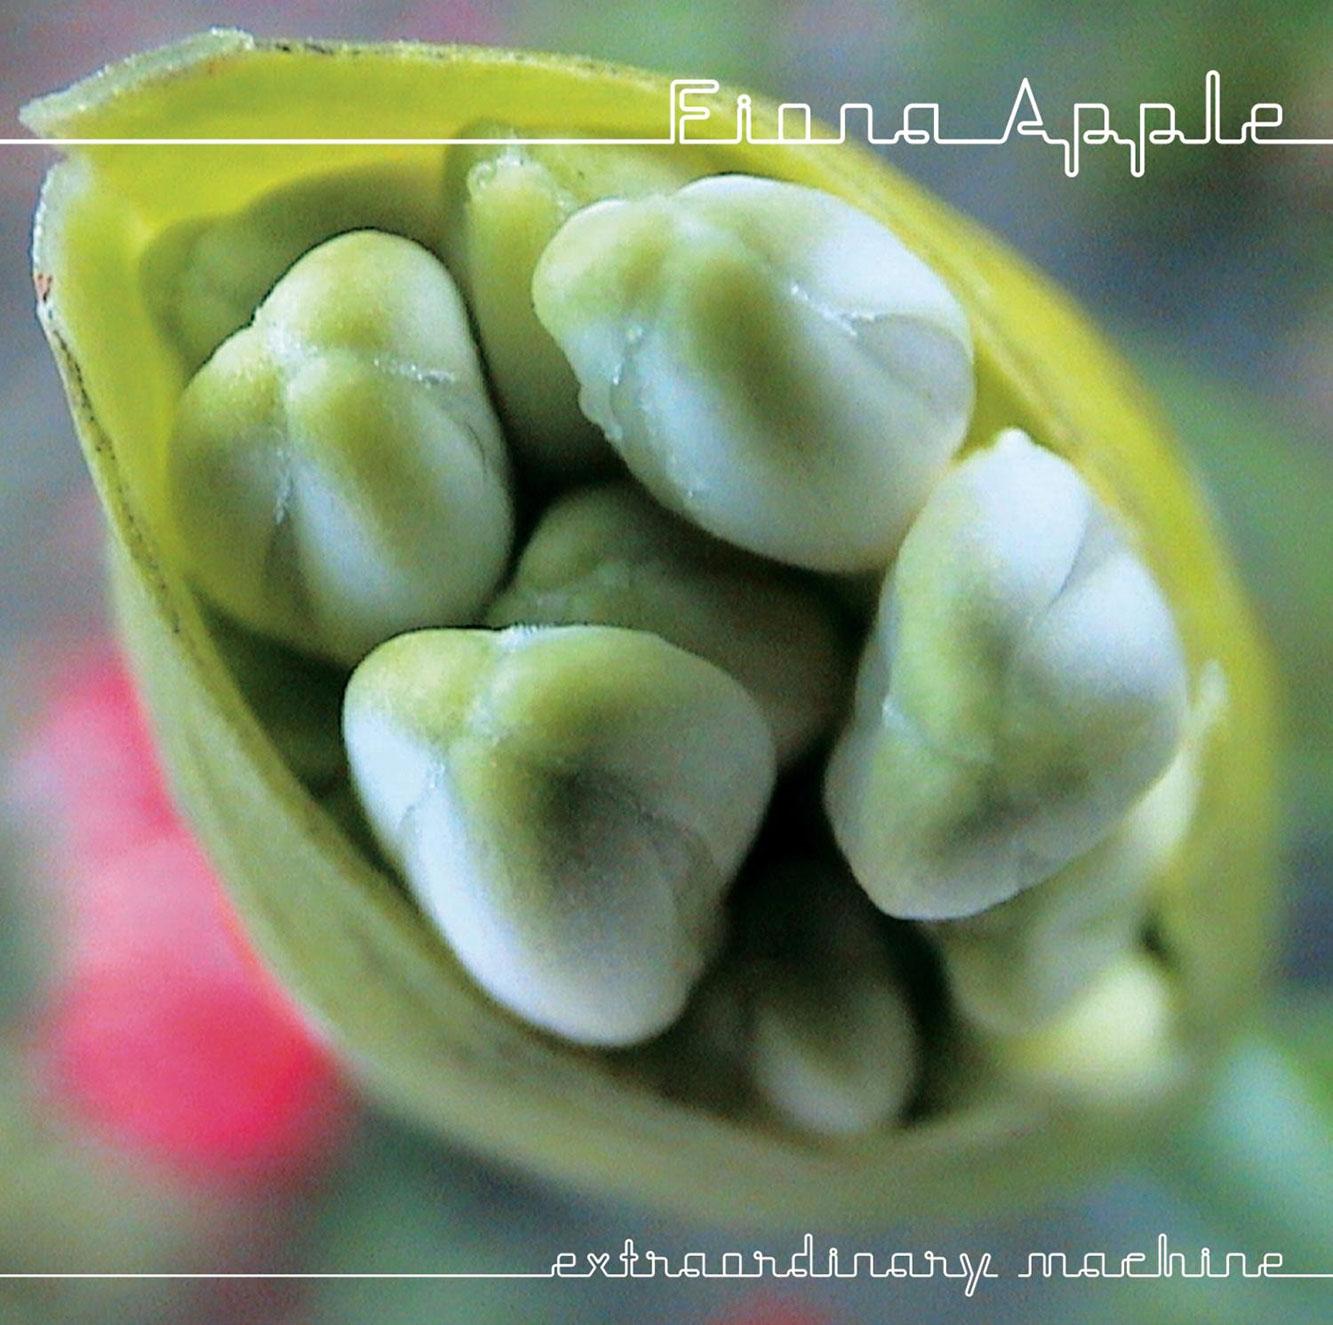 Extraordinary Machine by Fiona Apple